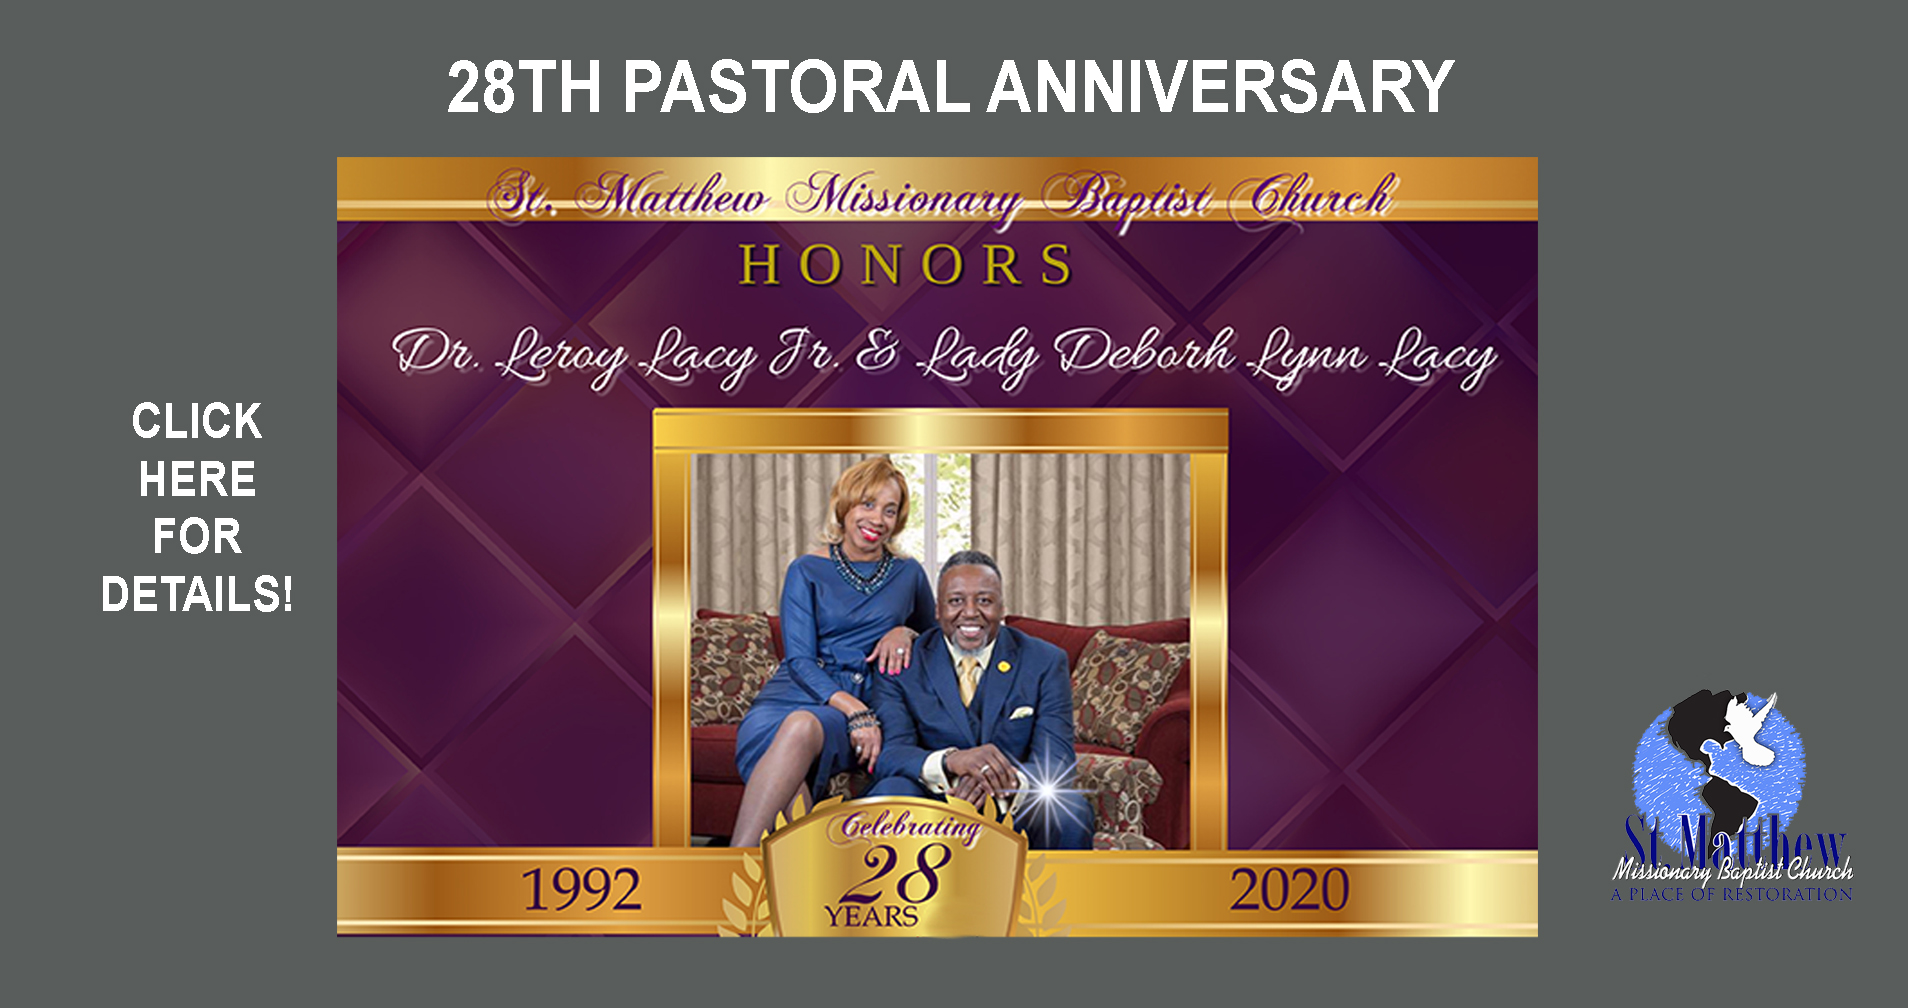 28th Pastoral Anniversary